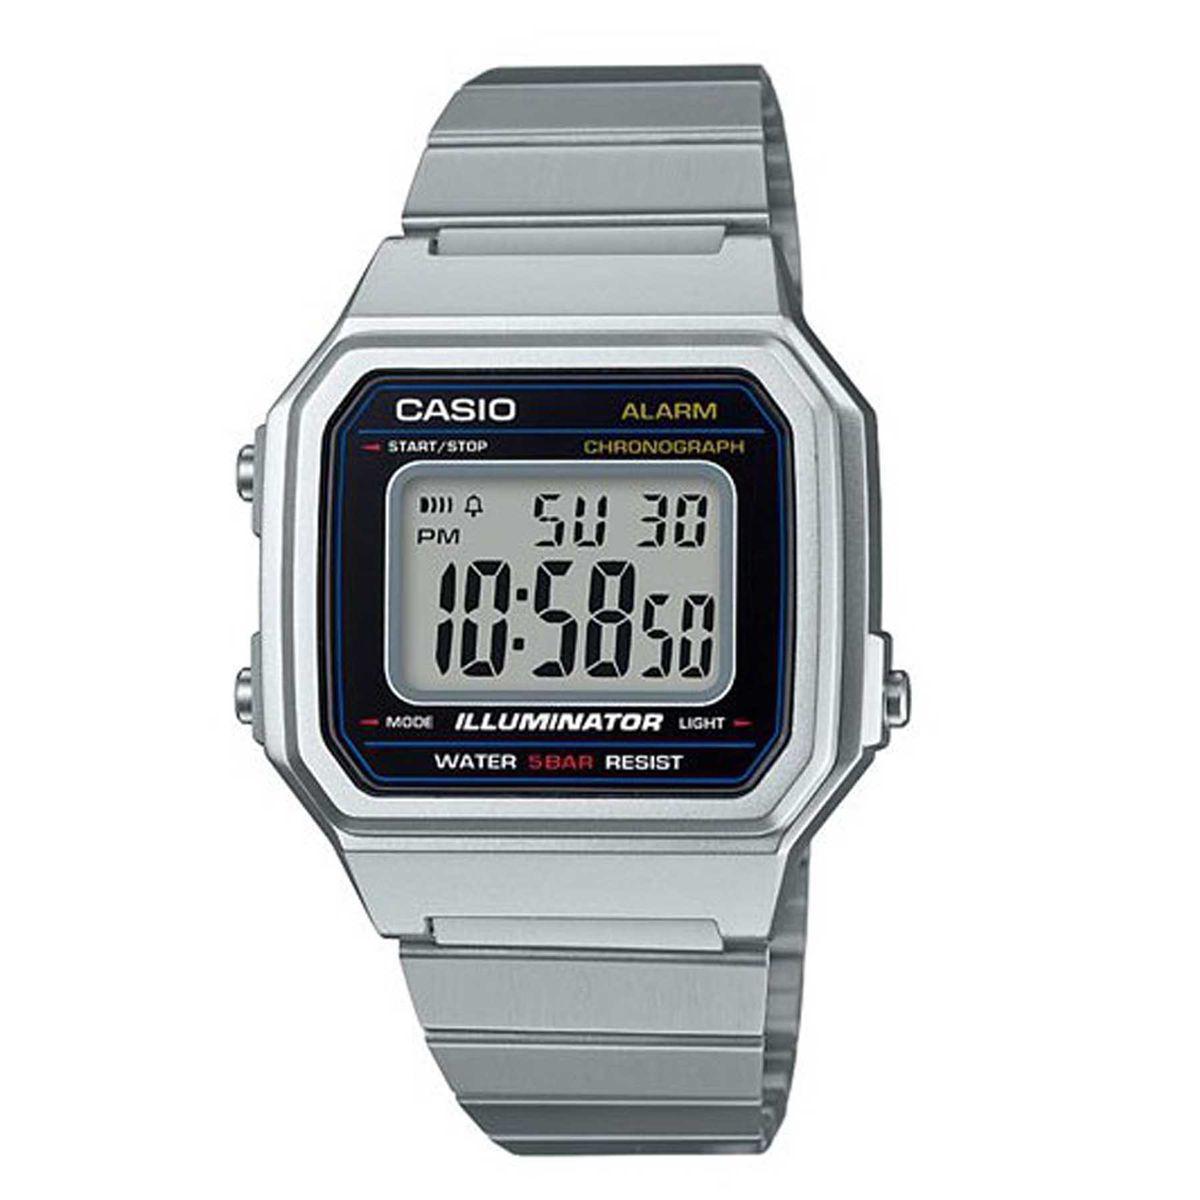 2c84dfda0a7 Relógio Casio Vintage Prata Digital Unissex B650WD-1ADF - Relógio ...